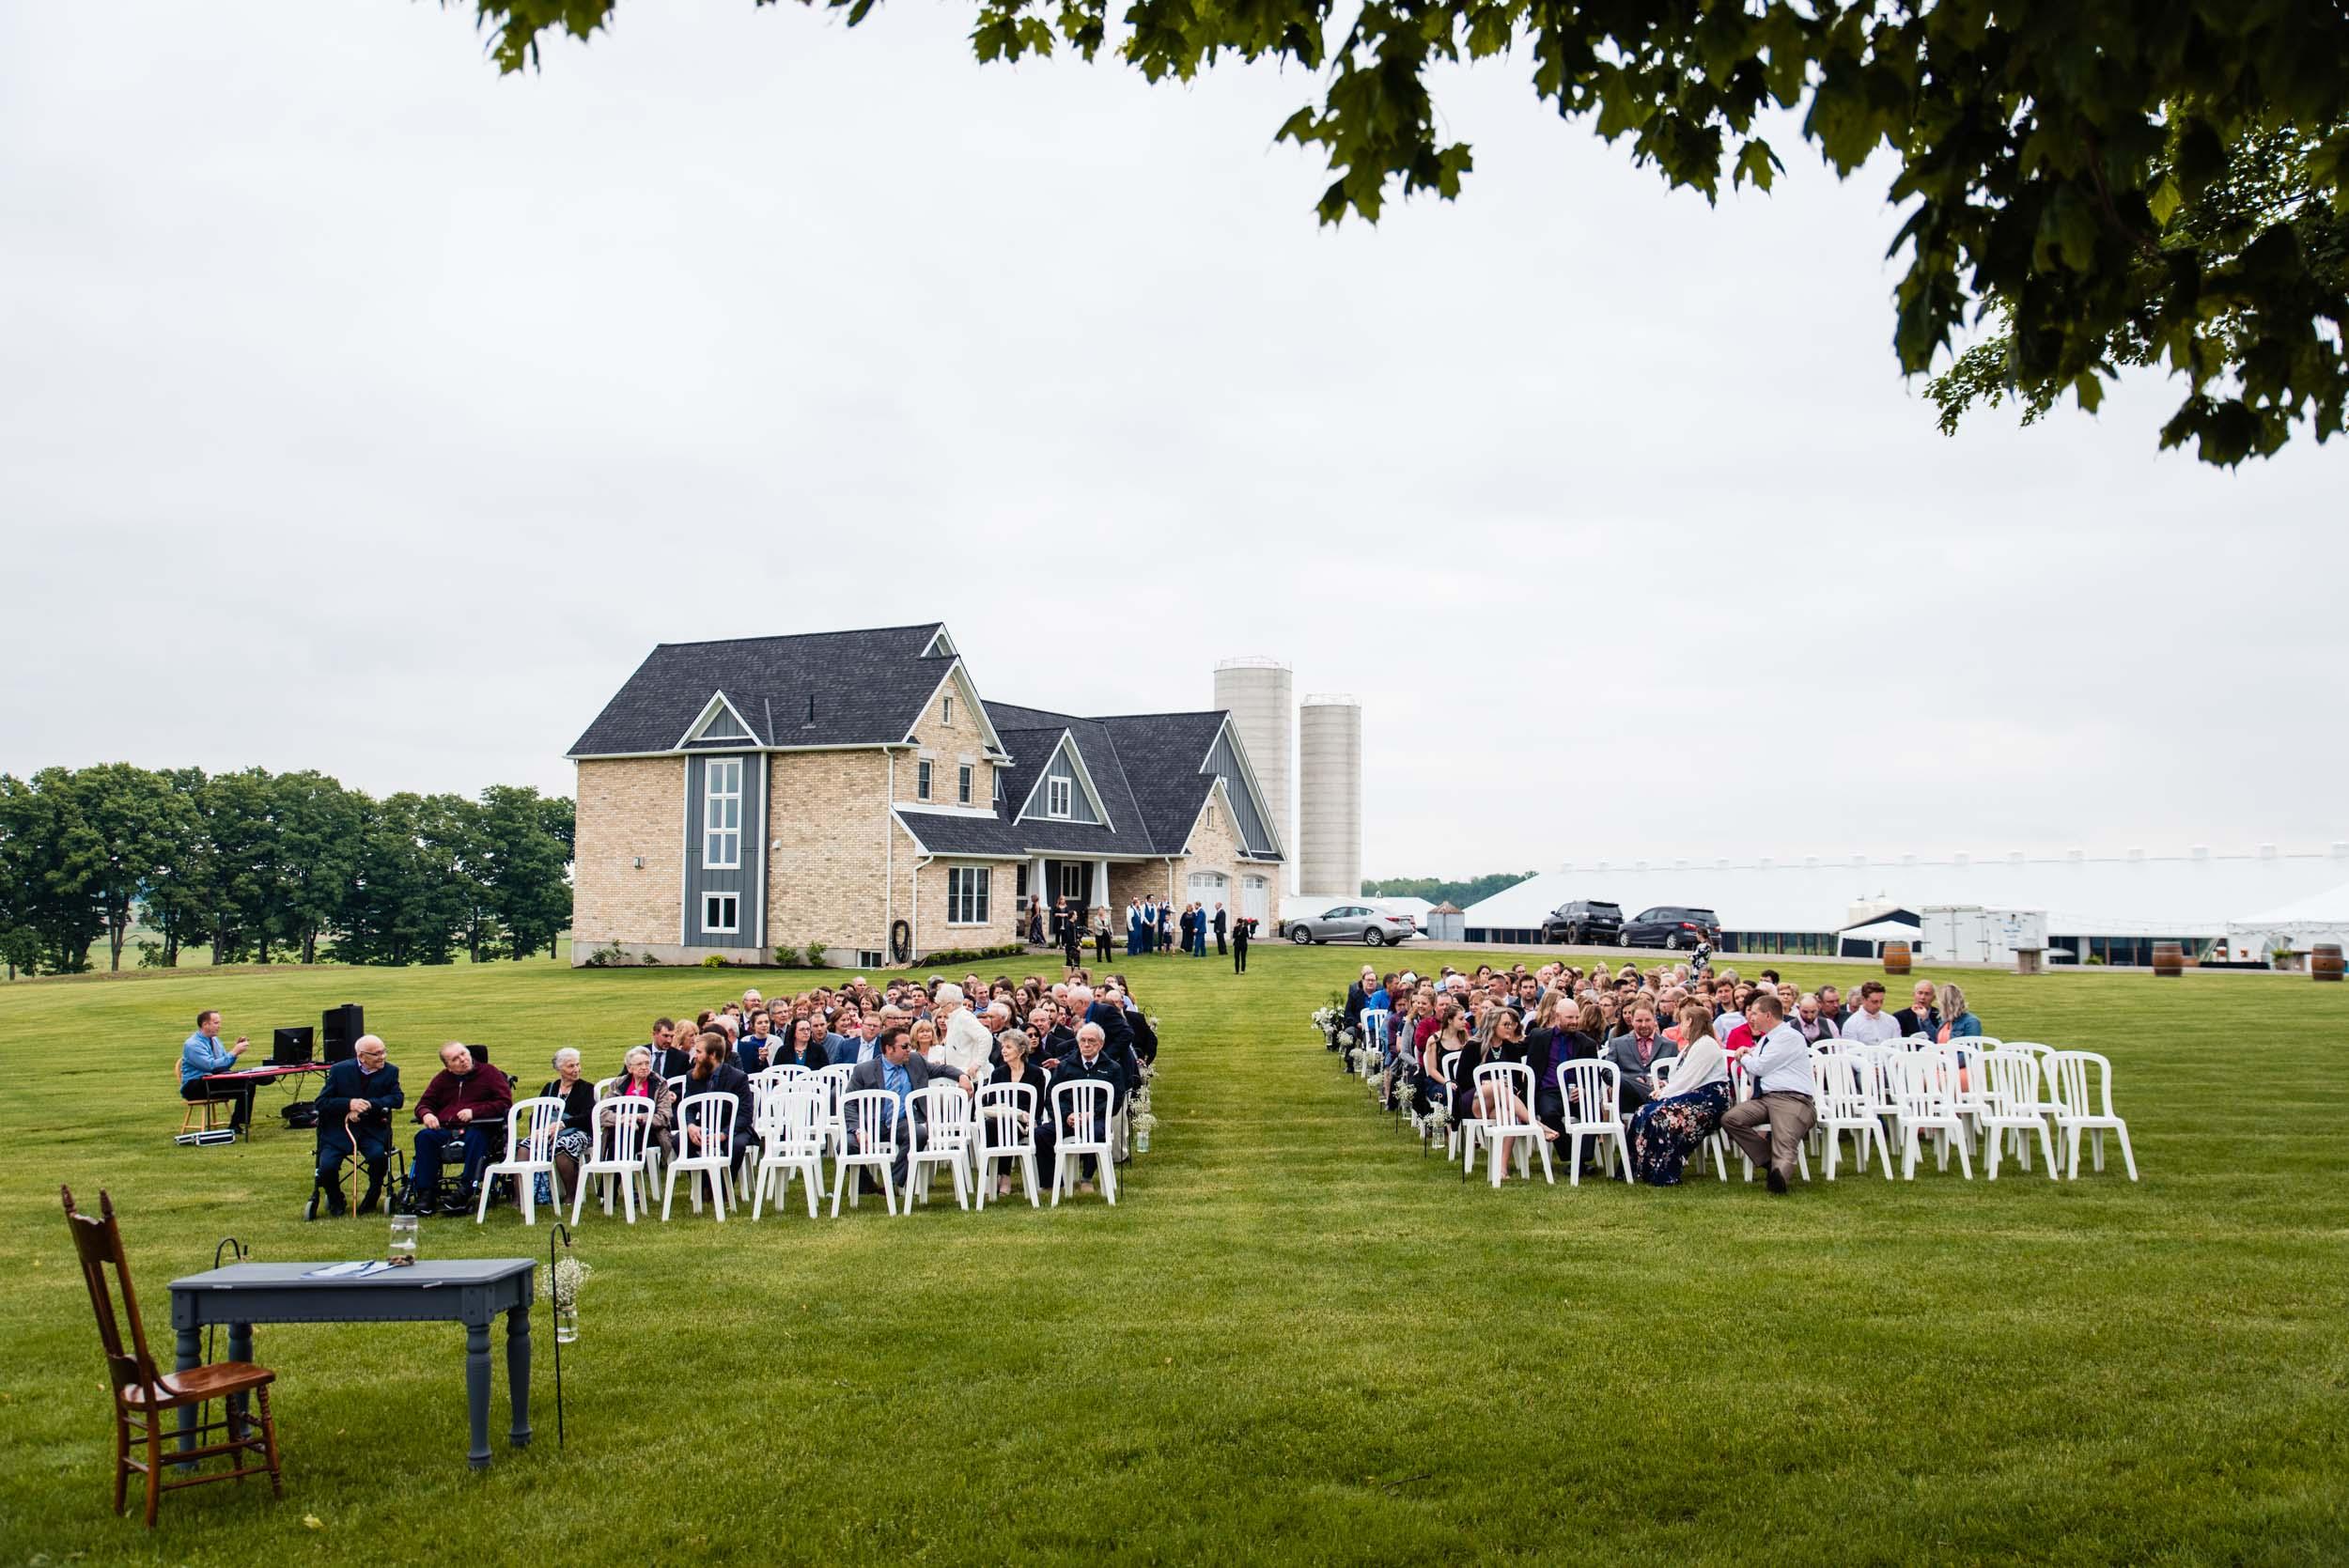 london-ontario-wedding-photography-farm-tent (40).jpg